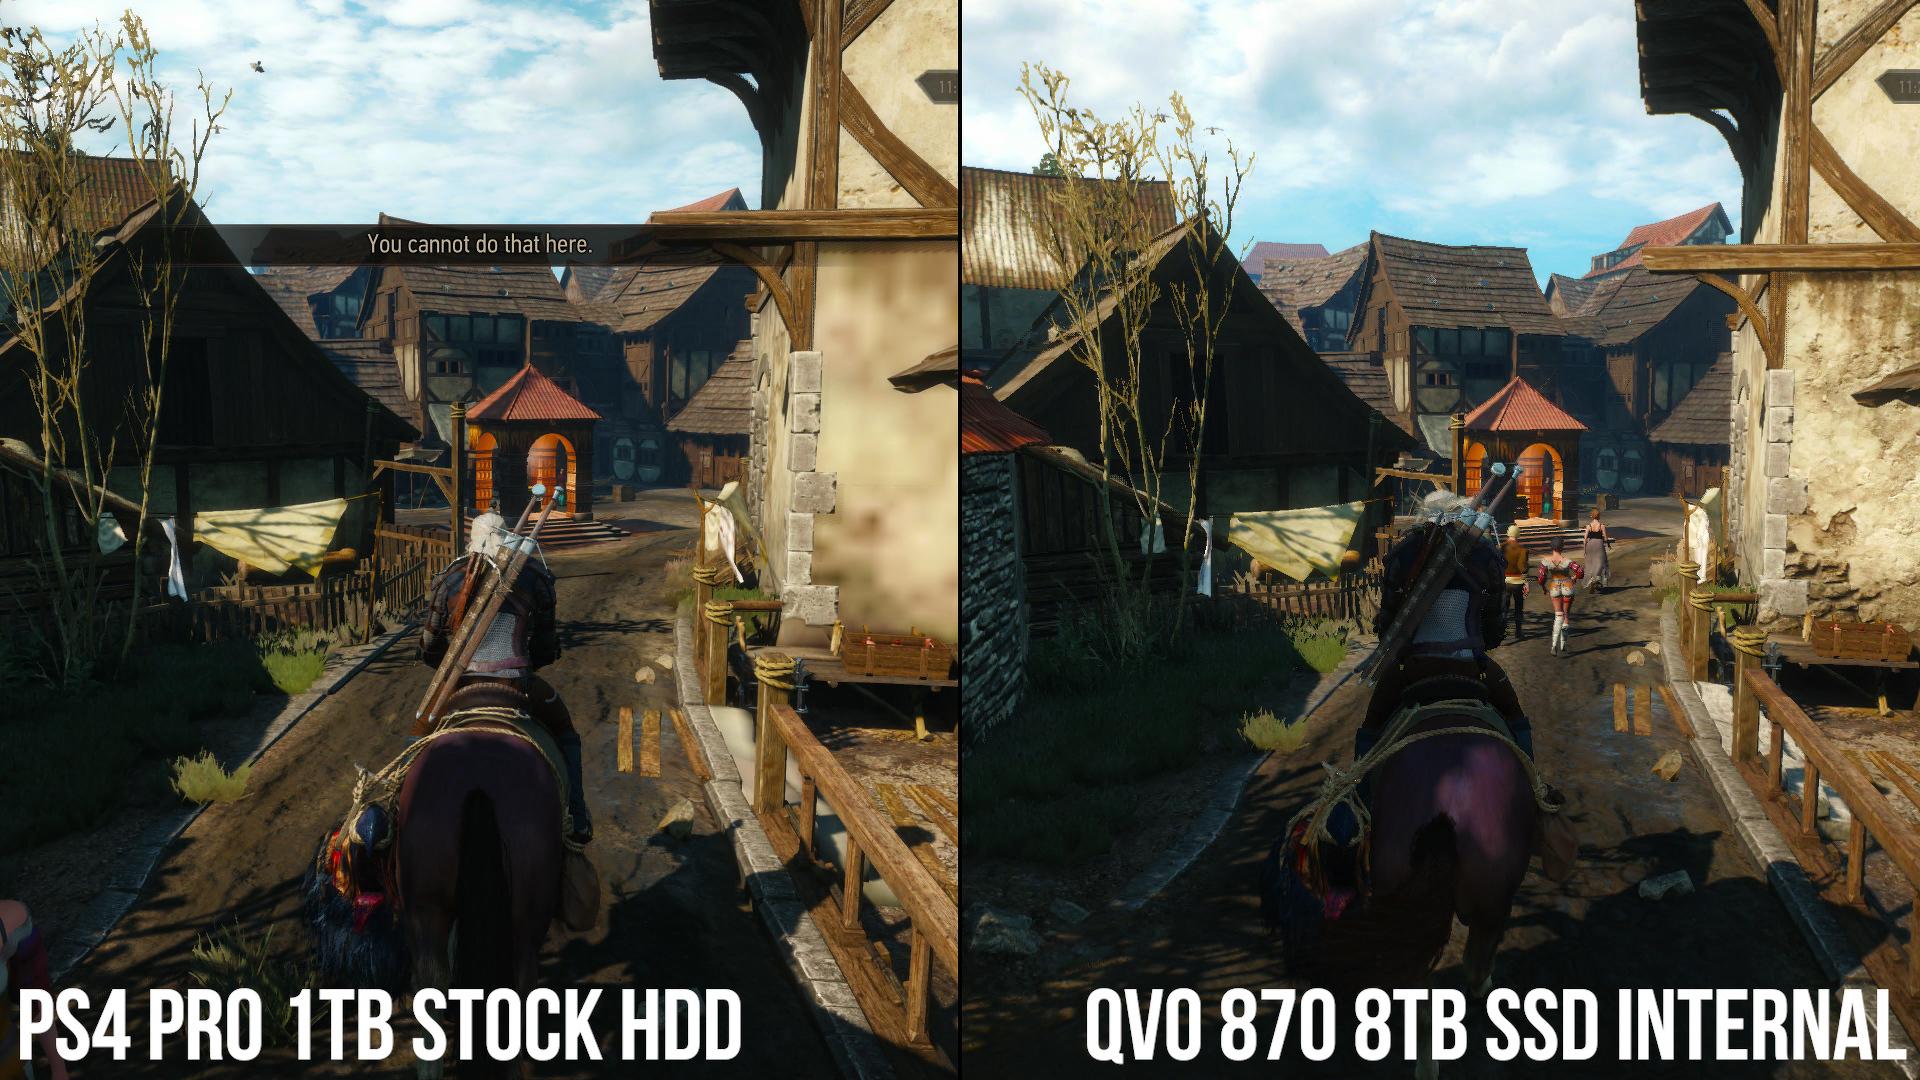 Digital Foundry: установка SSD в PS4 Pro значительно сокращает время загрузки и подгрузки текстур